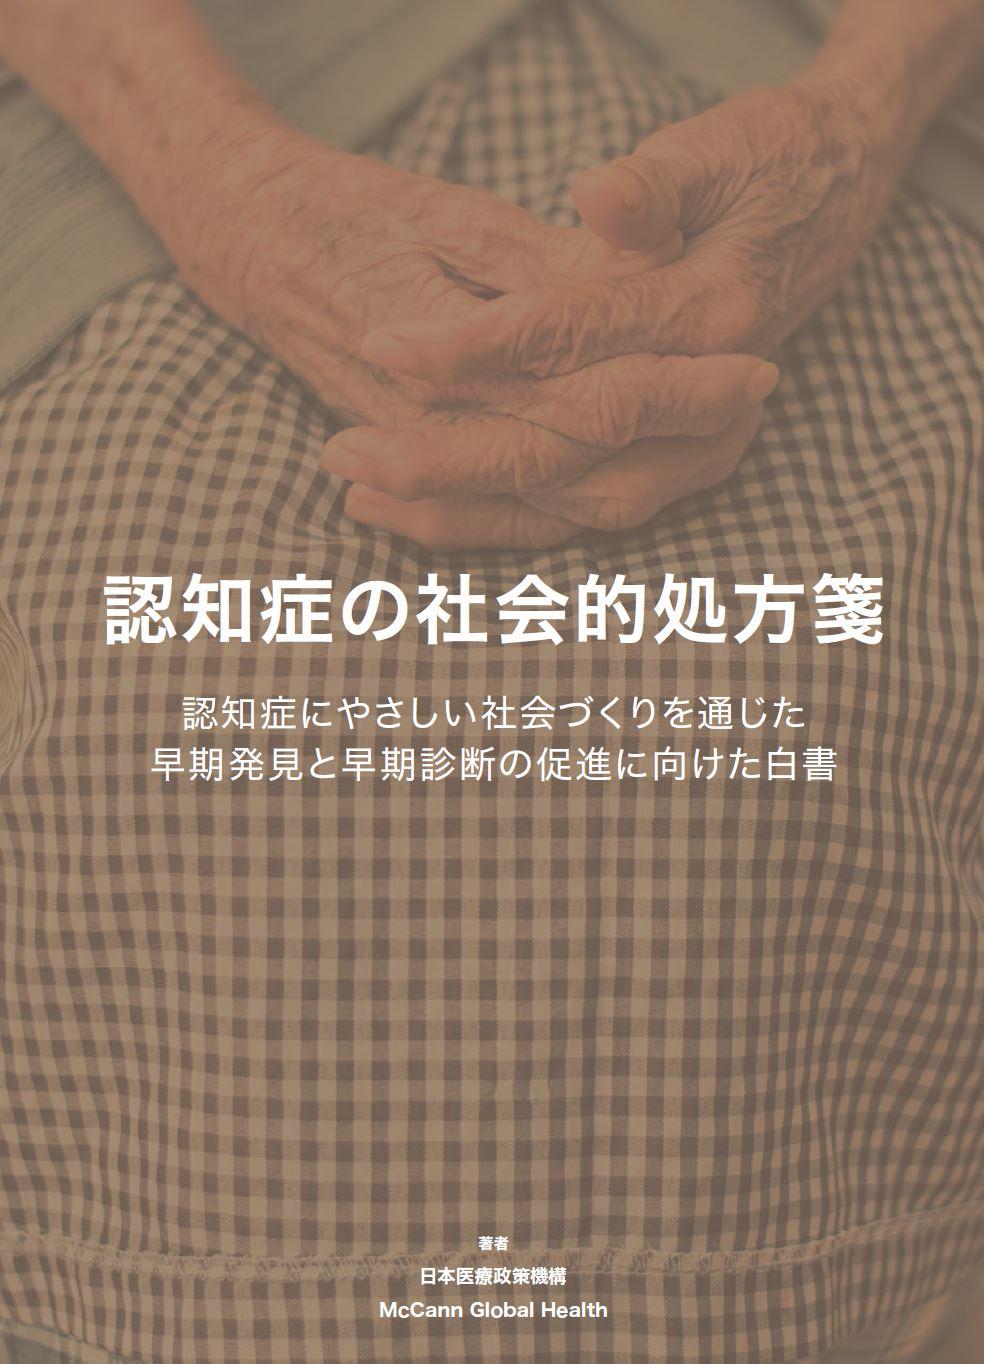 【HAMIQ】認知症の社会的処方箋/おもいやり災害食認証制度